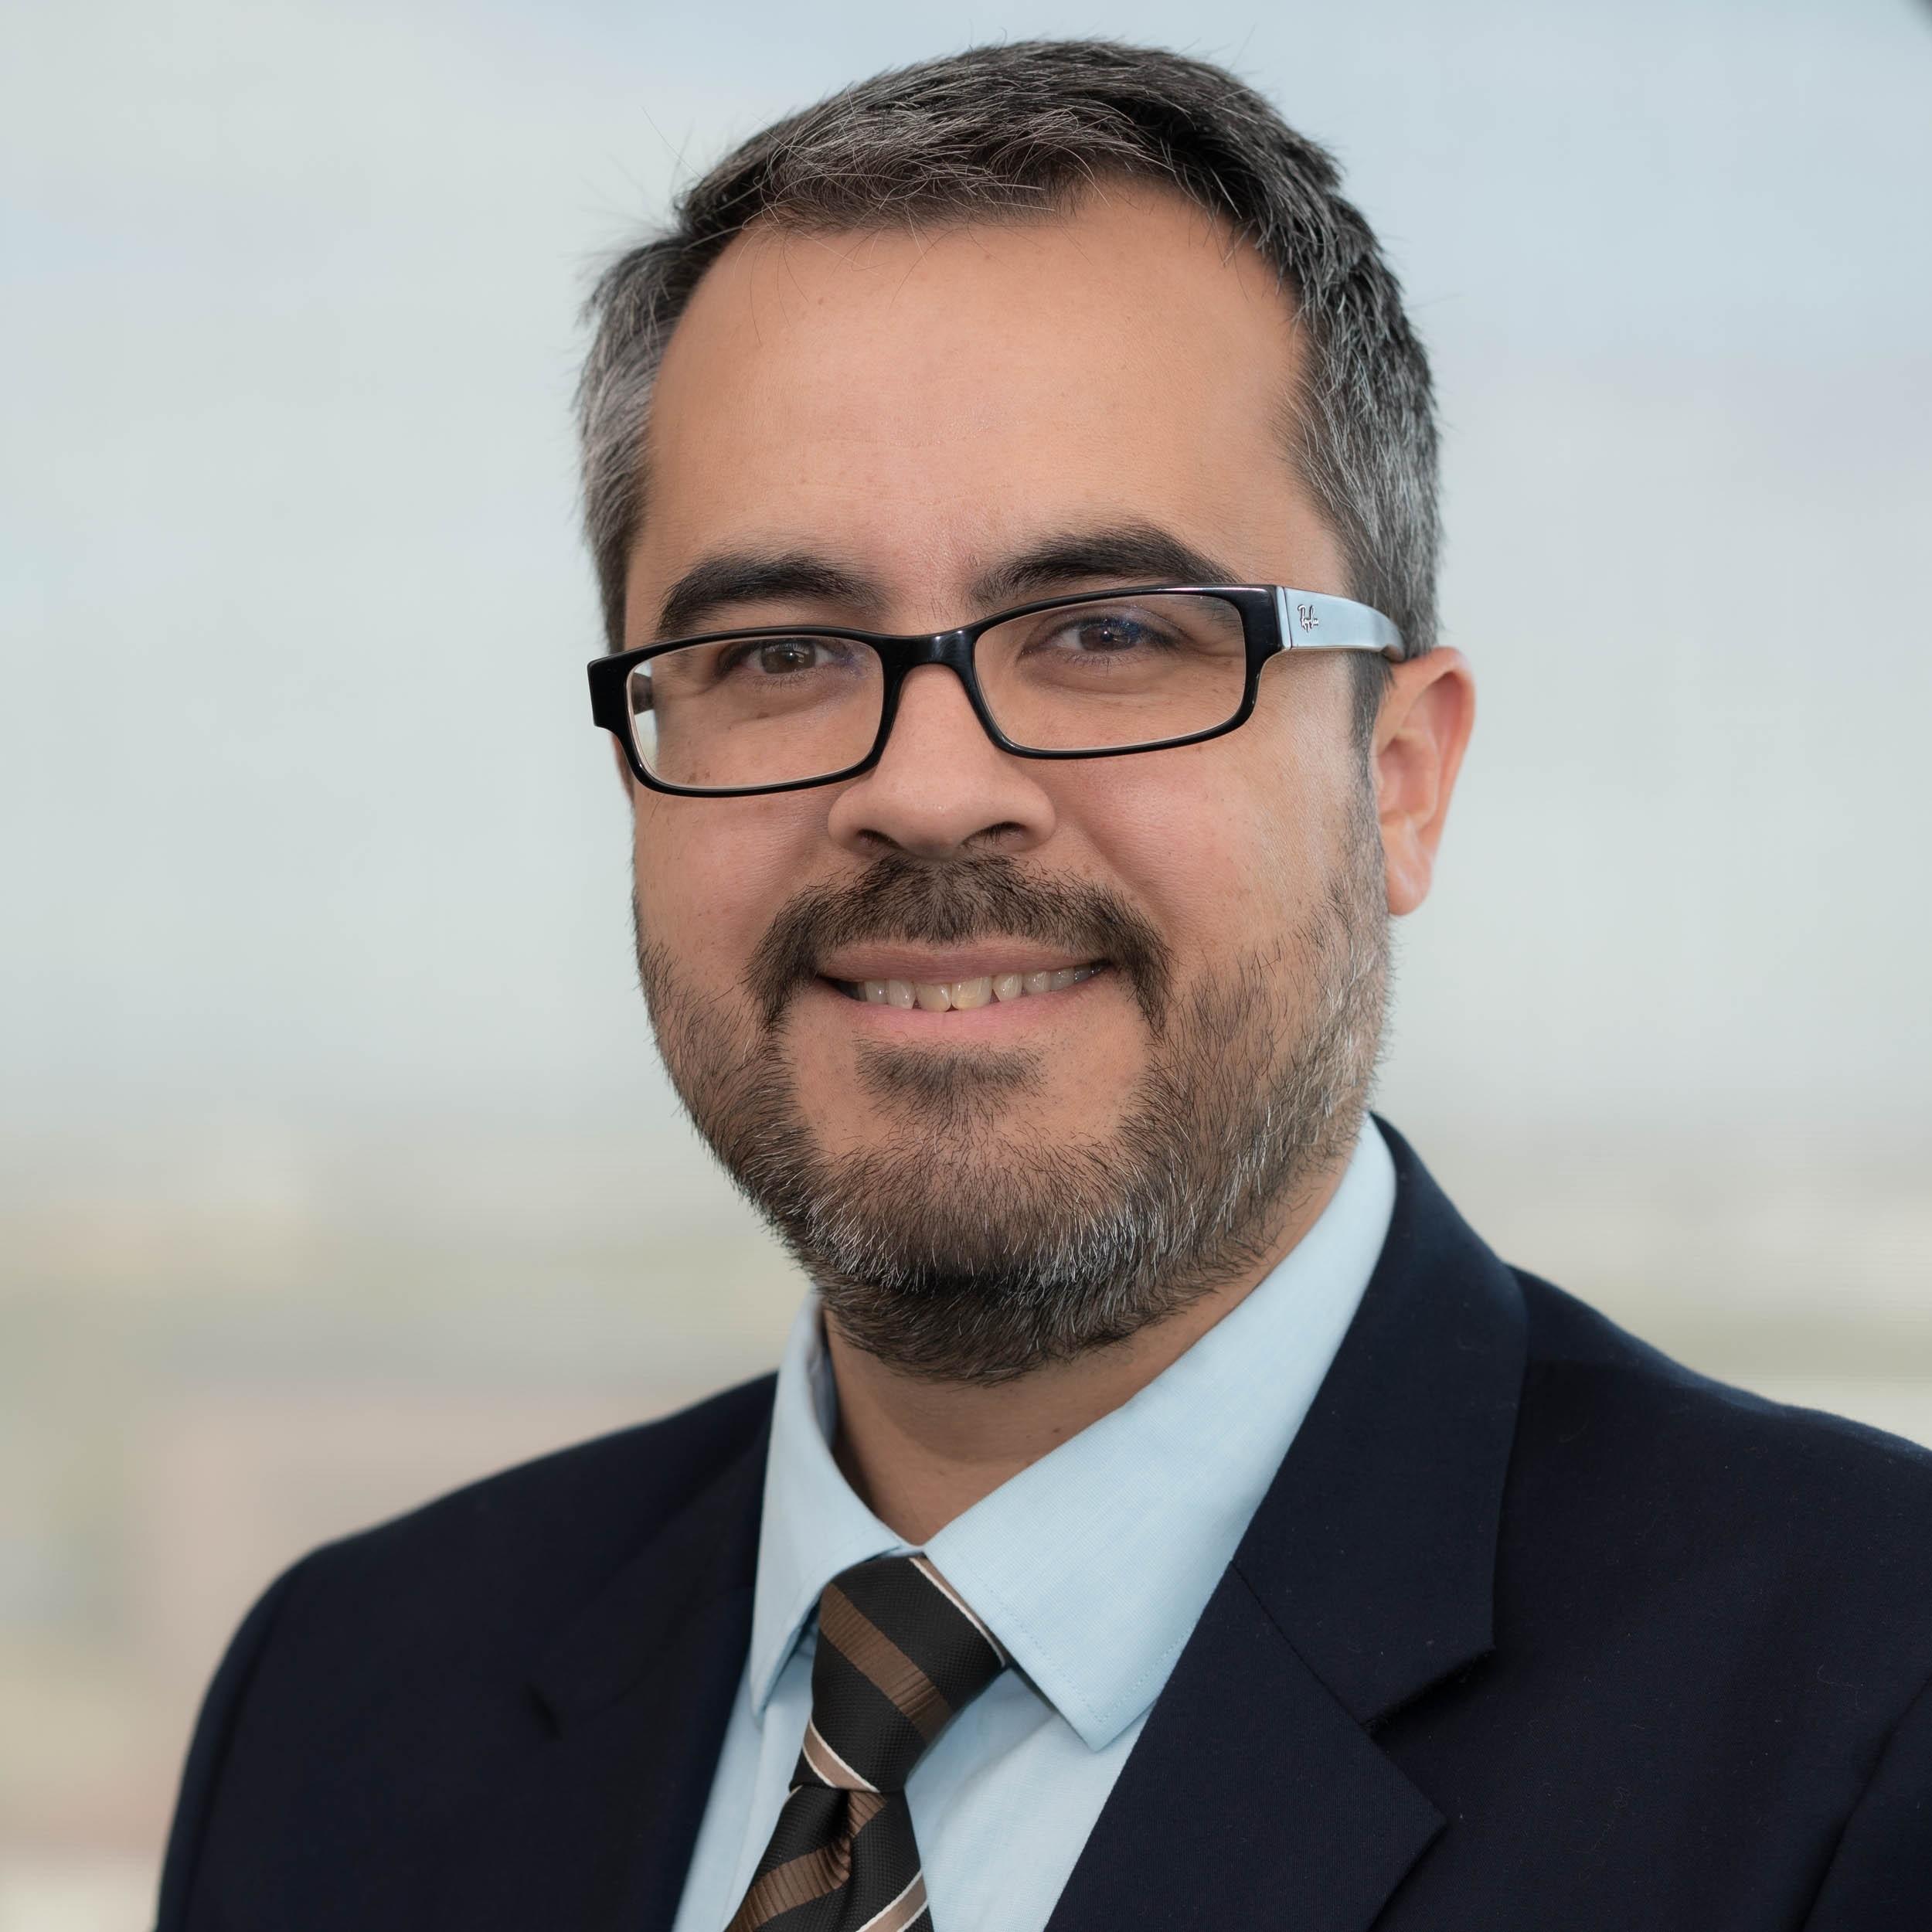 Jose R. Castillo-Mancilla